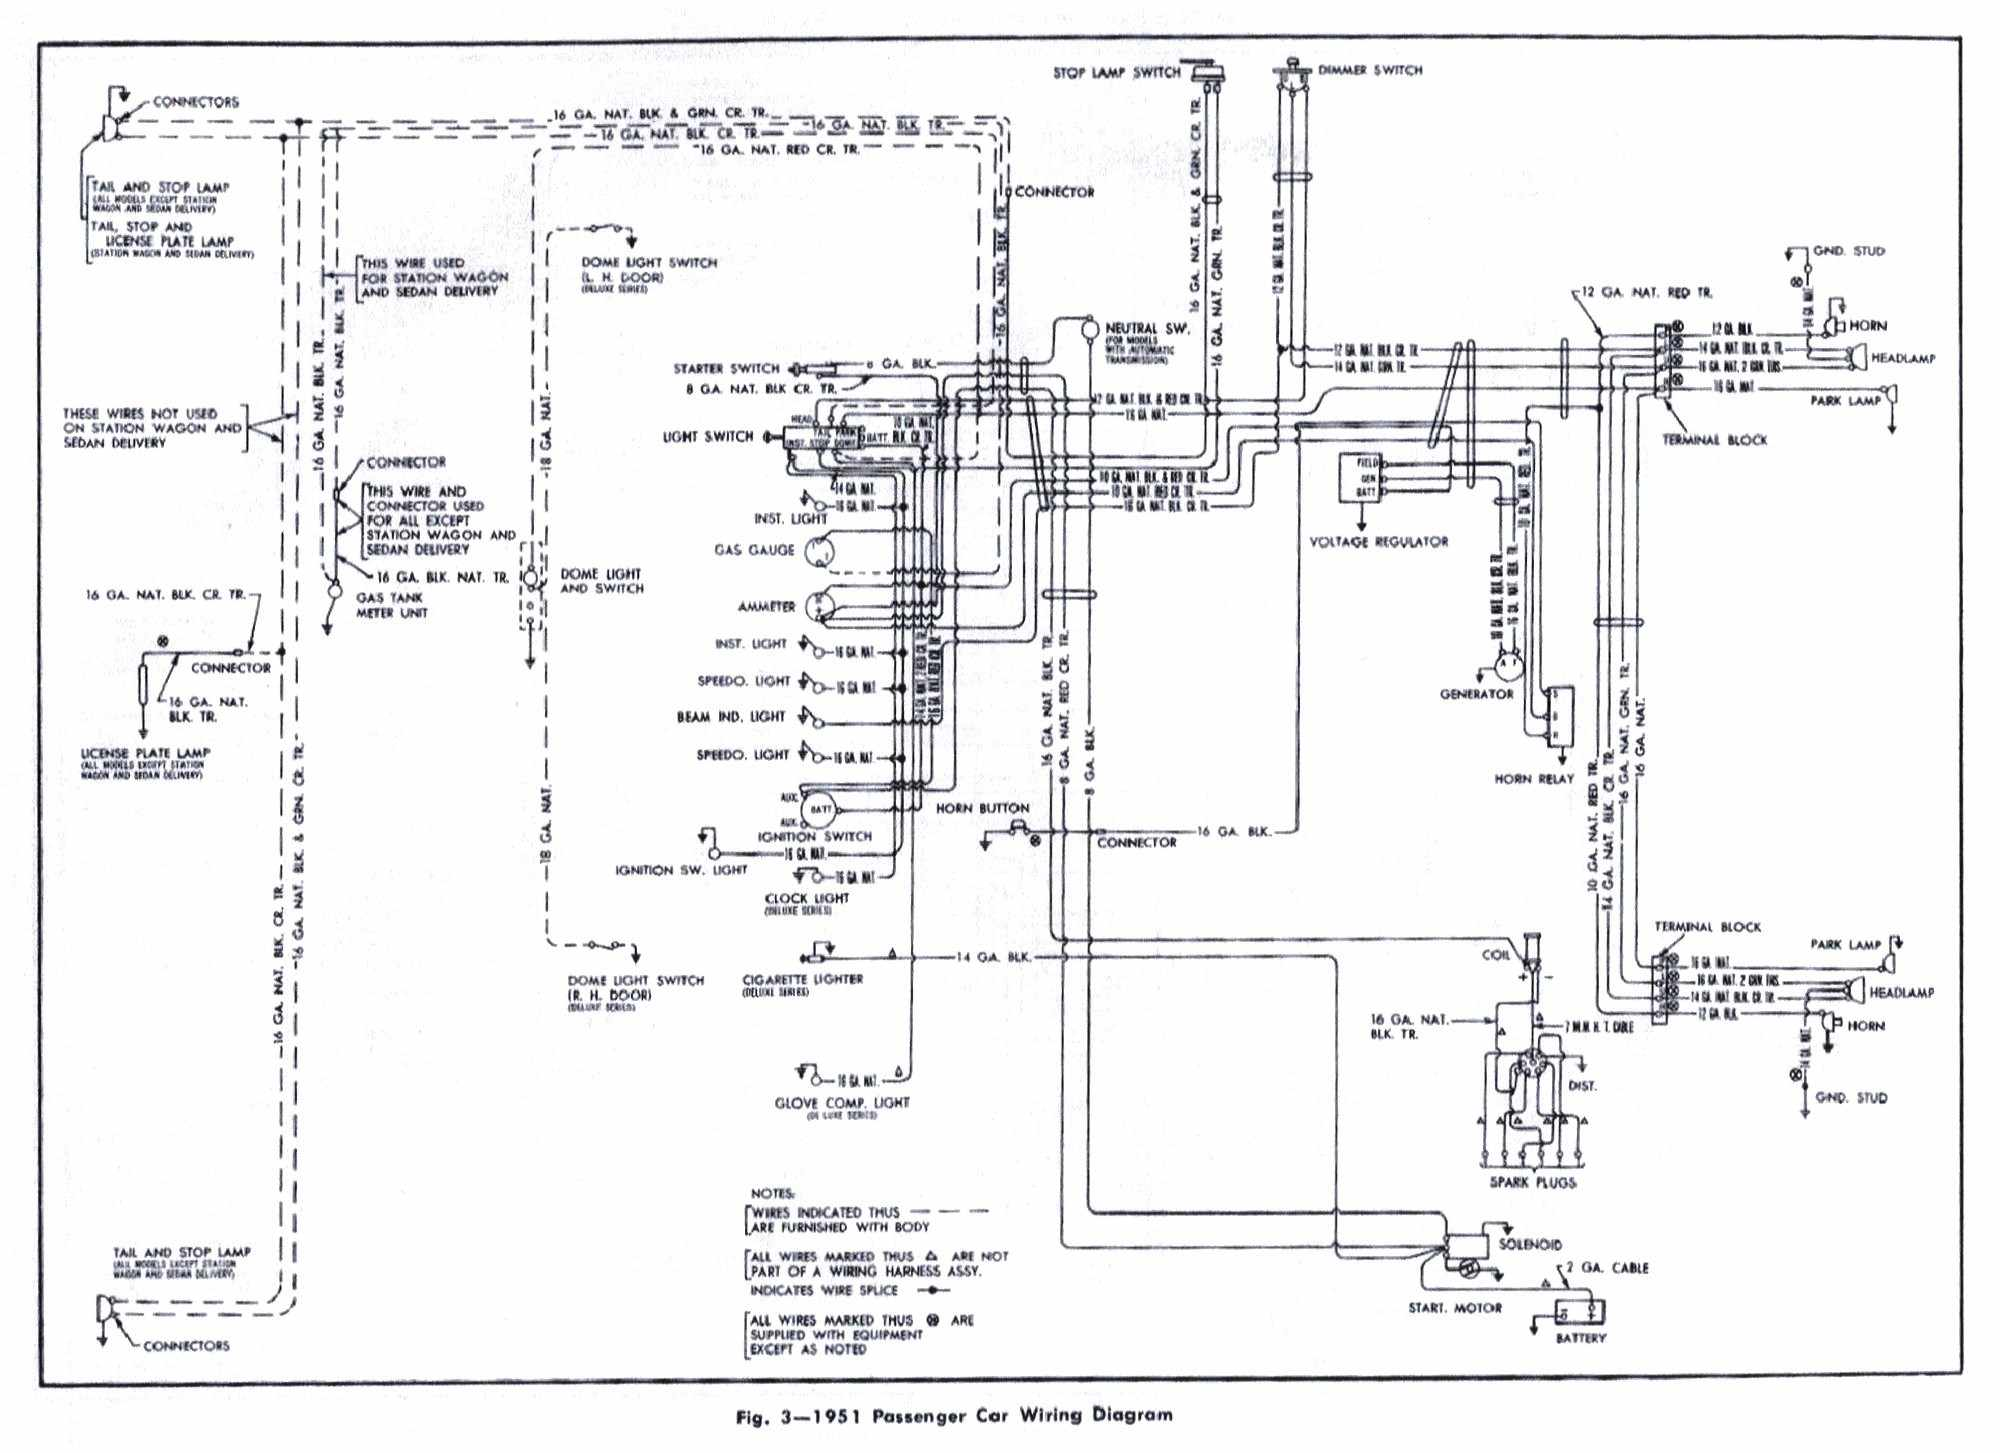 Toyota Forklift Fuse Box Car Wiring Diagrams Explained Diagram Old Rh Verrillos Com